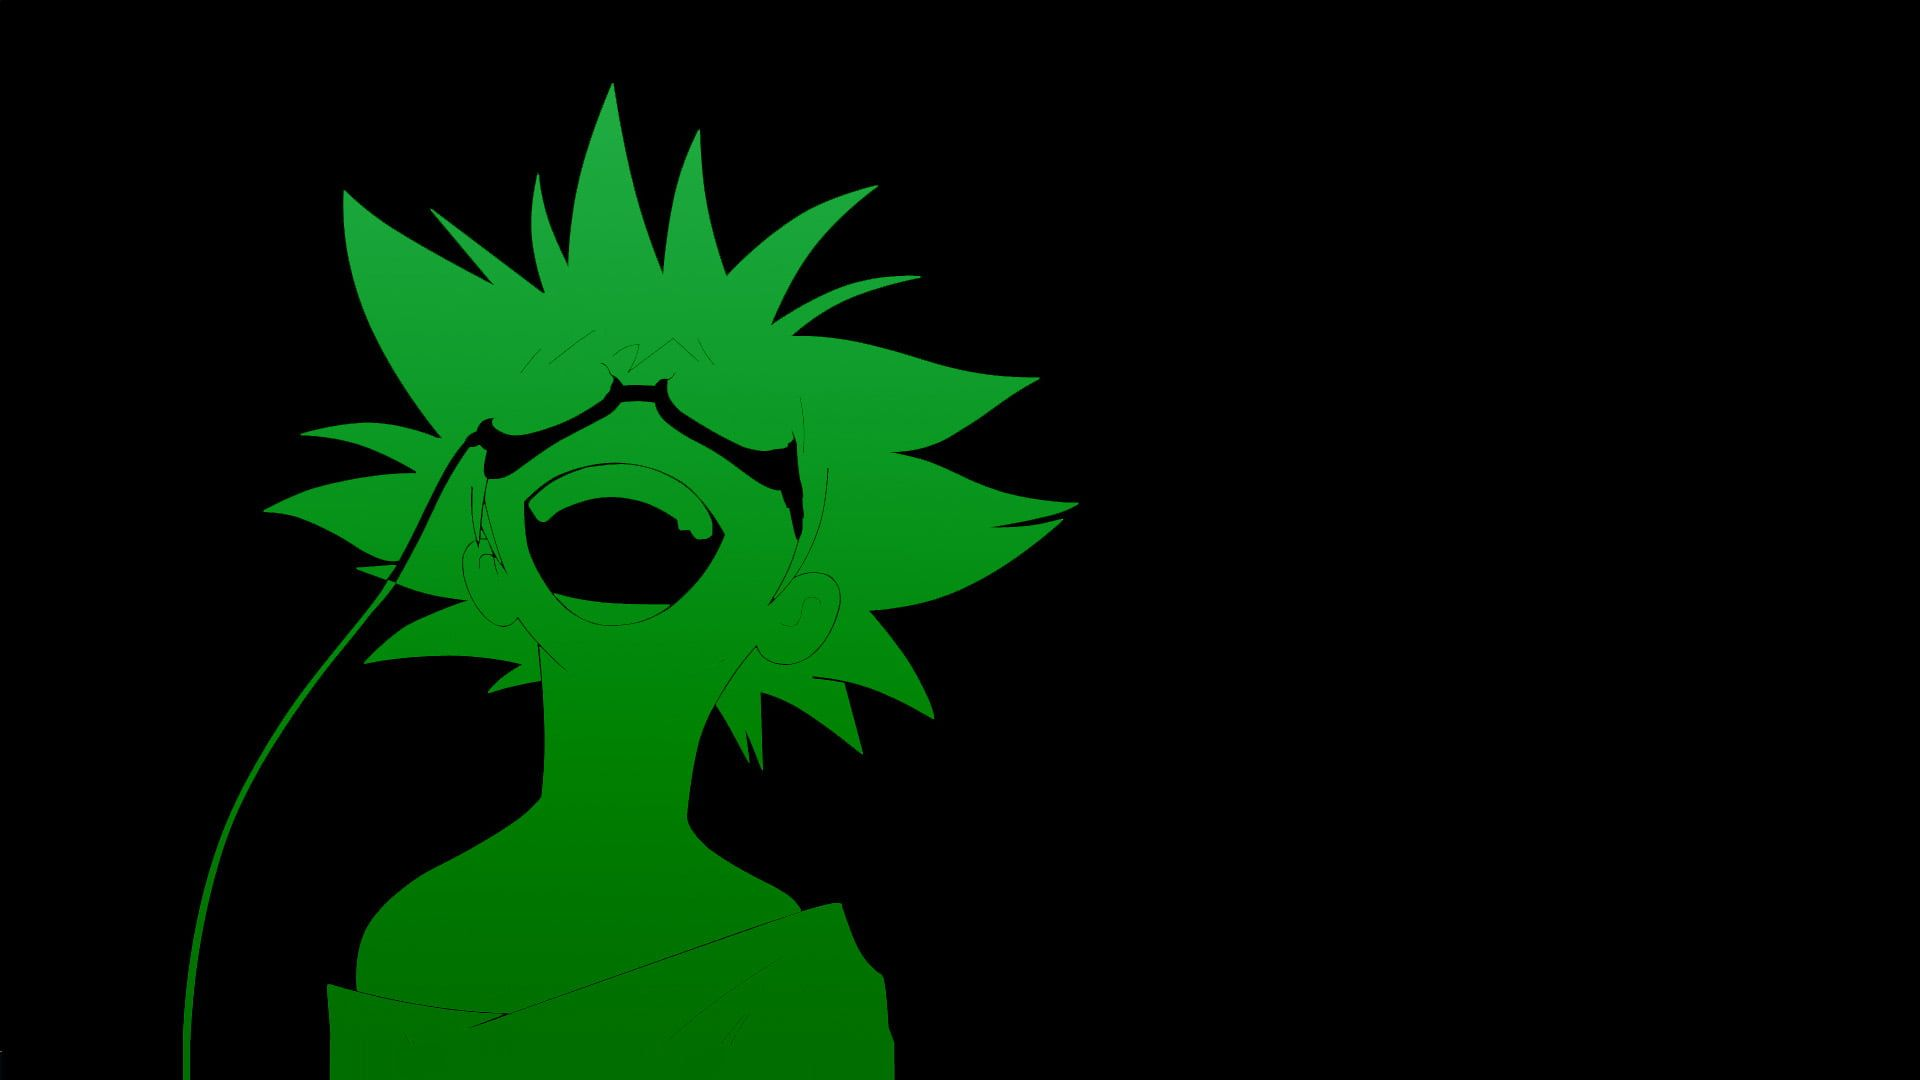 Green Silhouette Of Boy Wallpaper Cowboy Bebop Anime Green Black Background Anime Boys 1080p In 2021 Cowboy Bebop Wallpapers Anime Wallpaper Android Wallpaper Anime